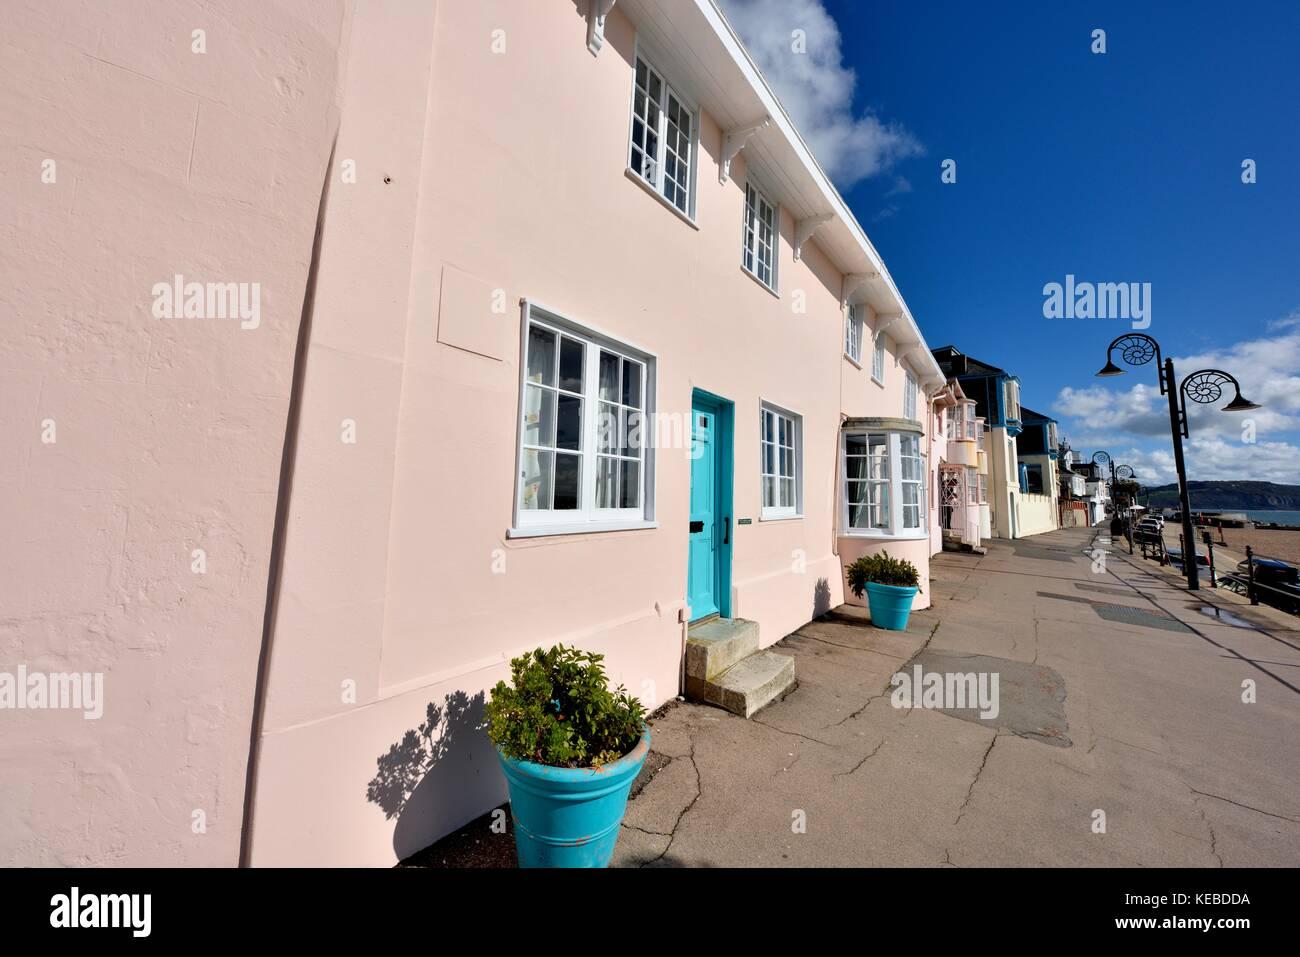 Awesome Seaside Holiday Cottages Lyme Regis Dorset England Uk Stock Home Remodeling Inspirations Genioncuboardxyz